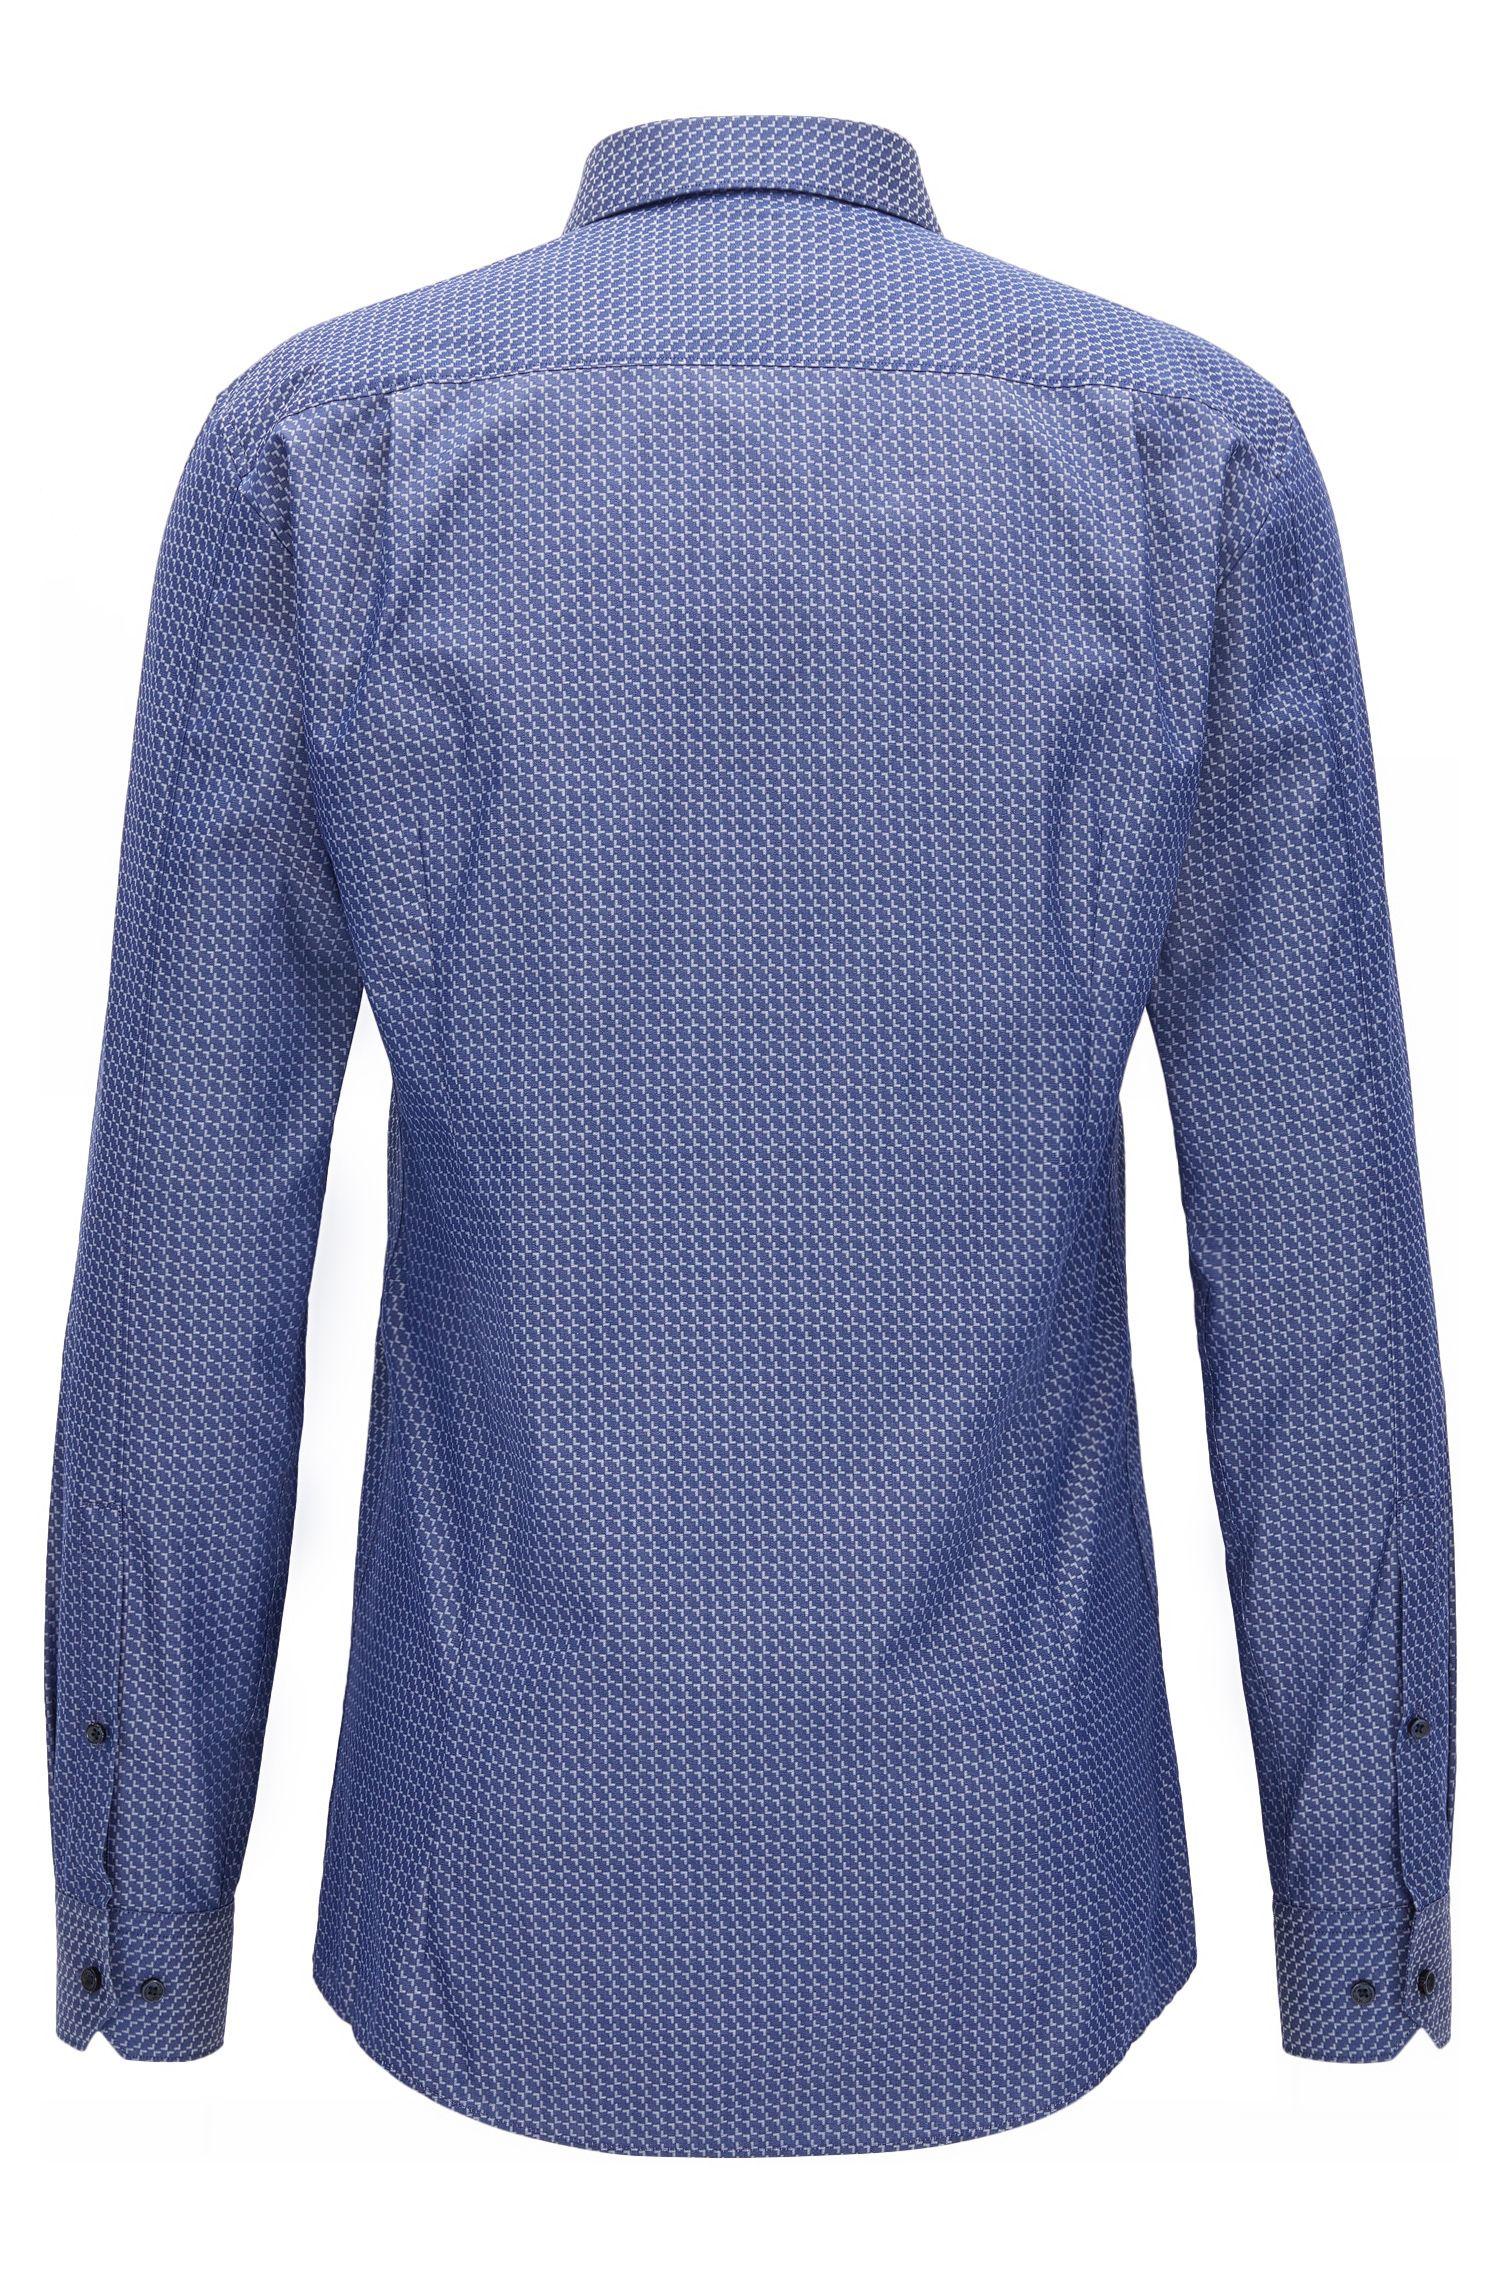 Patterned Cotton Dress Shirt, Extra Slim Fit | Elisha